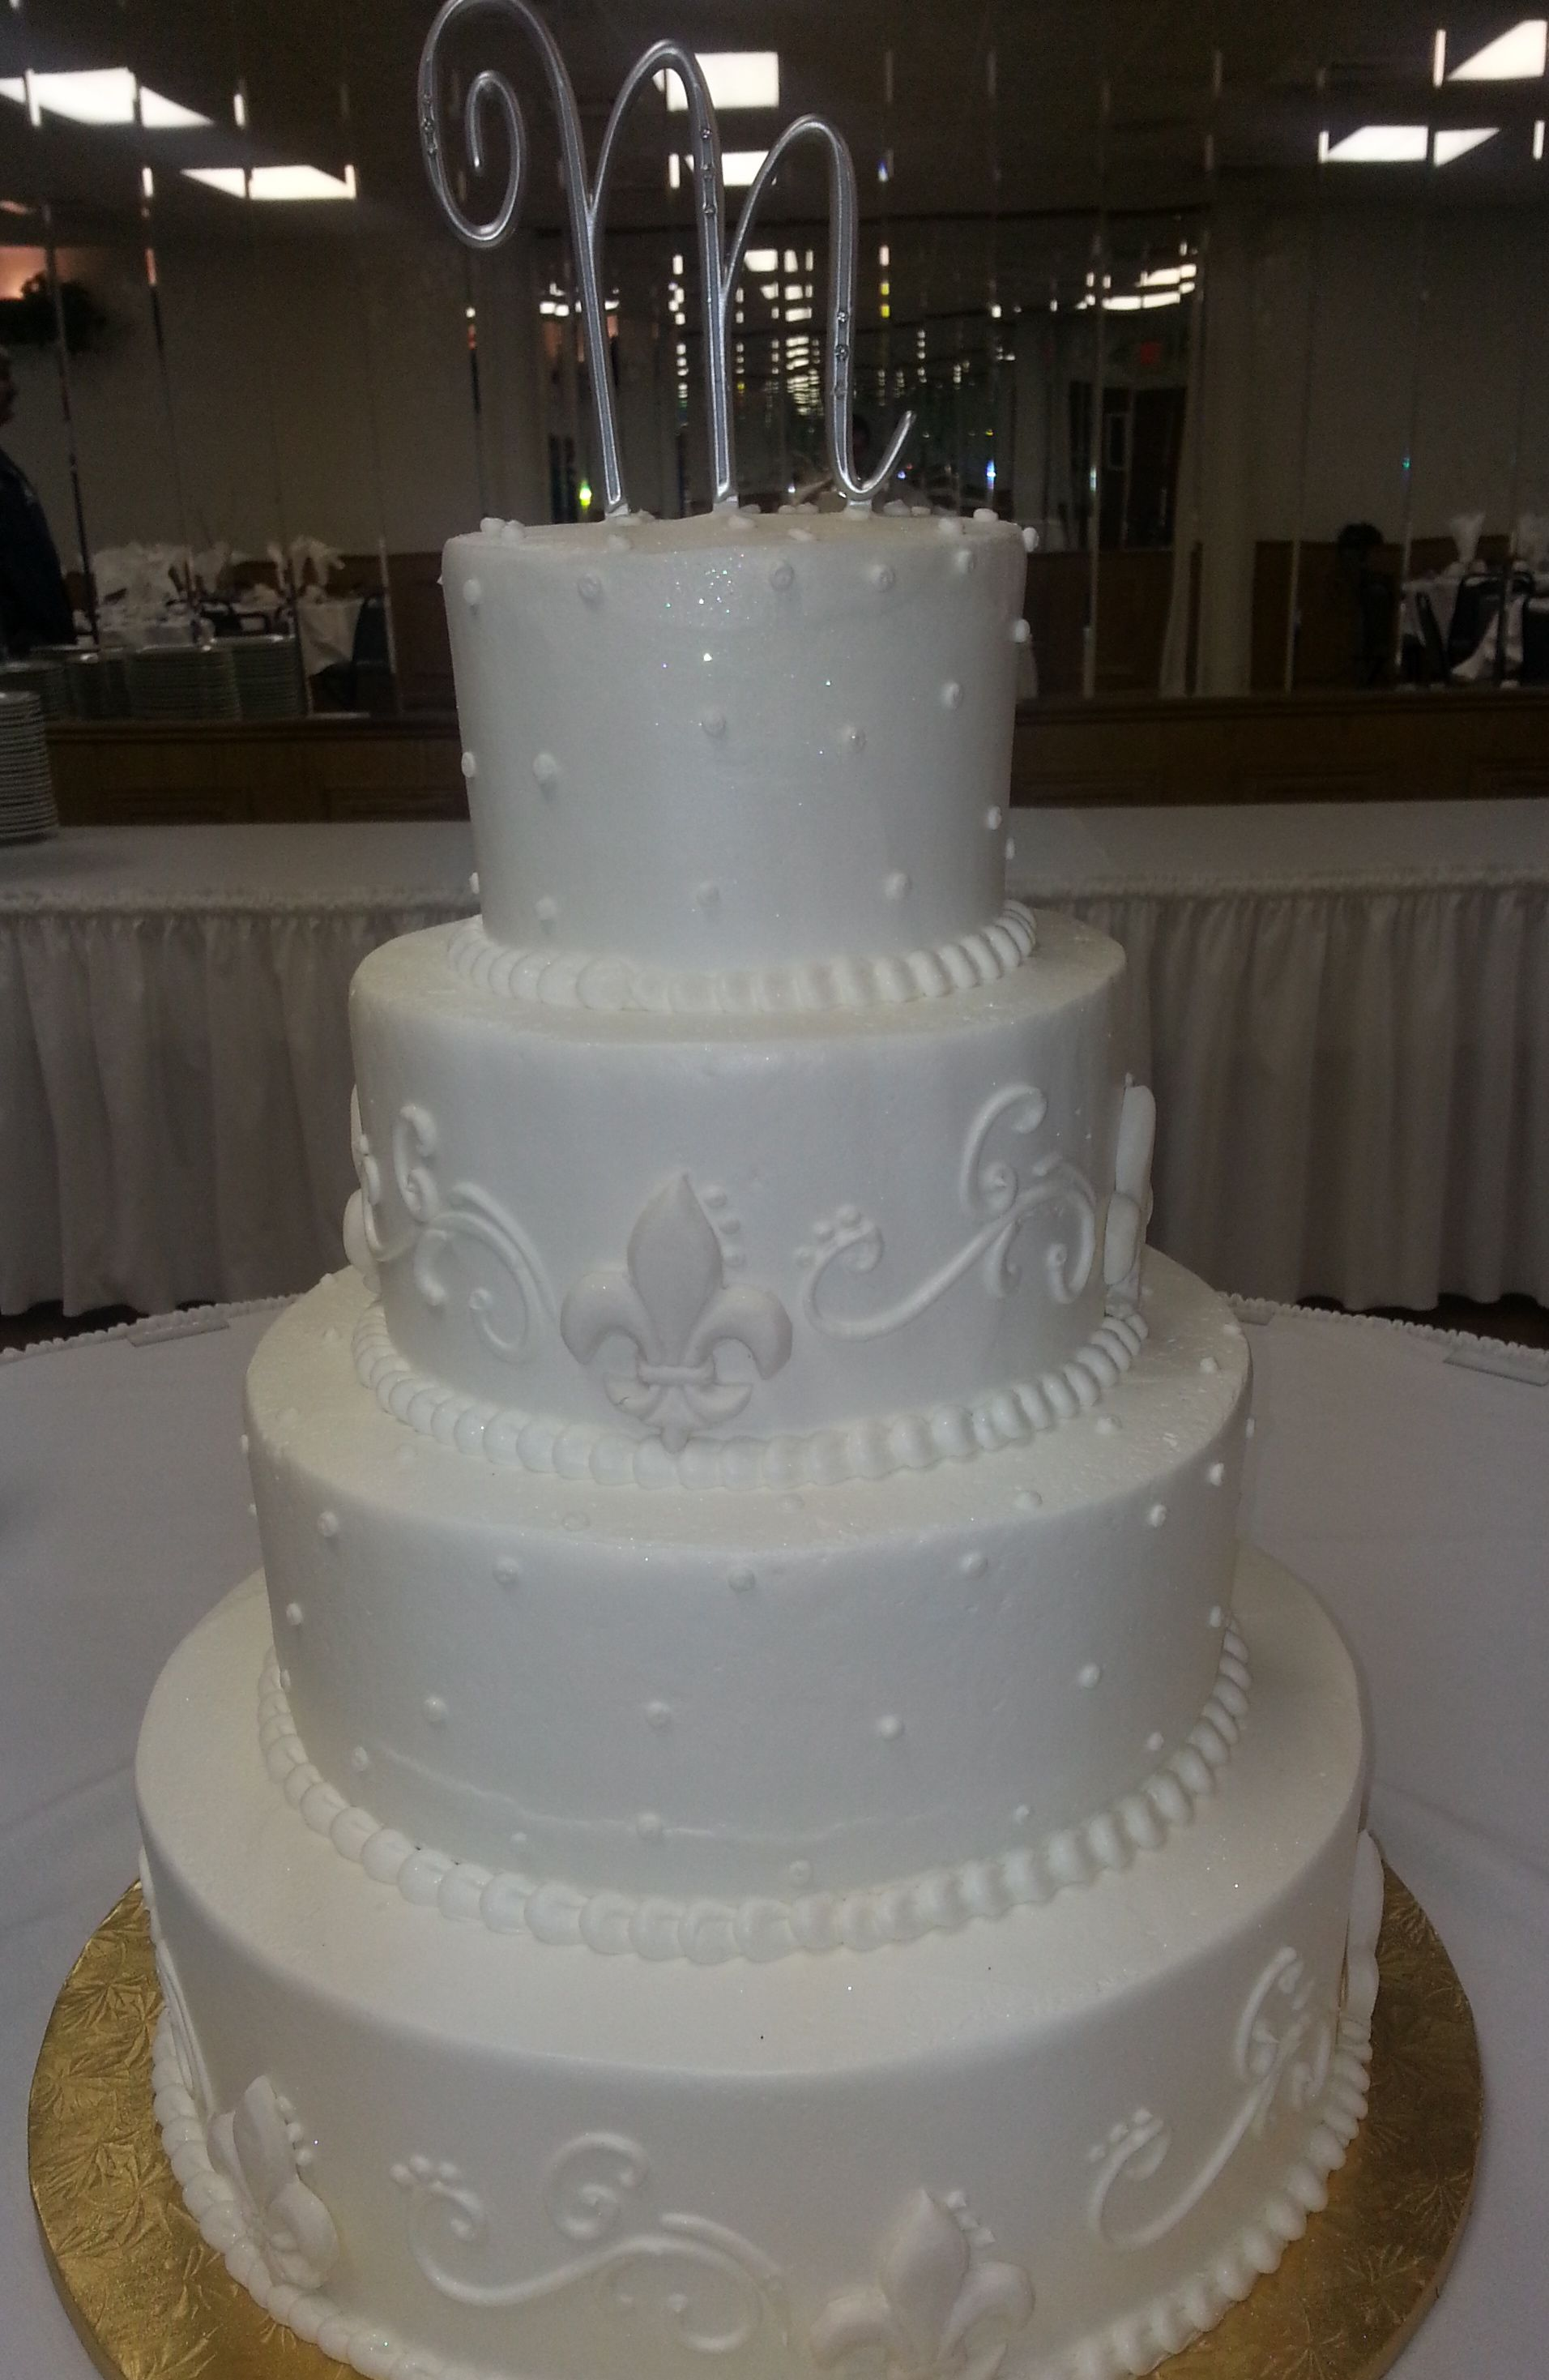 Calumet Bakery Wedding Cake With Fleur De Lis Details Wedding